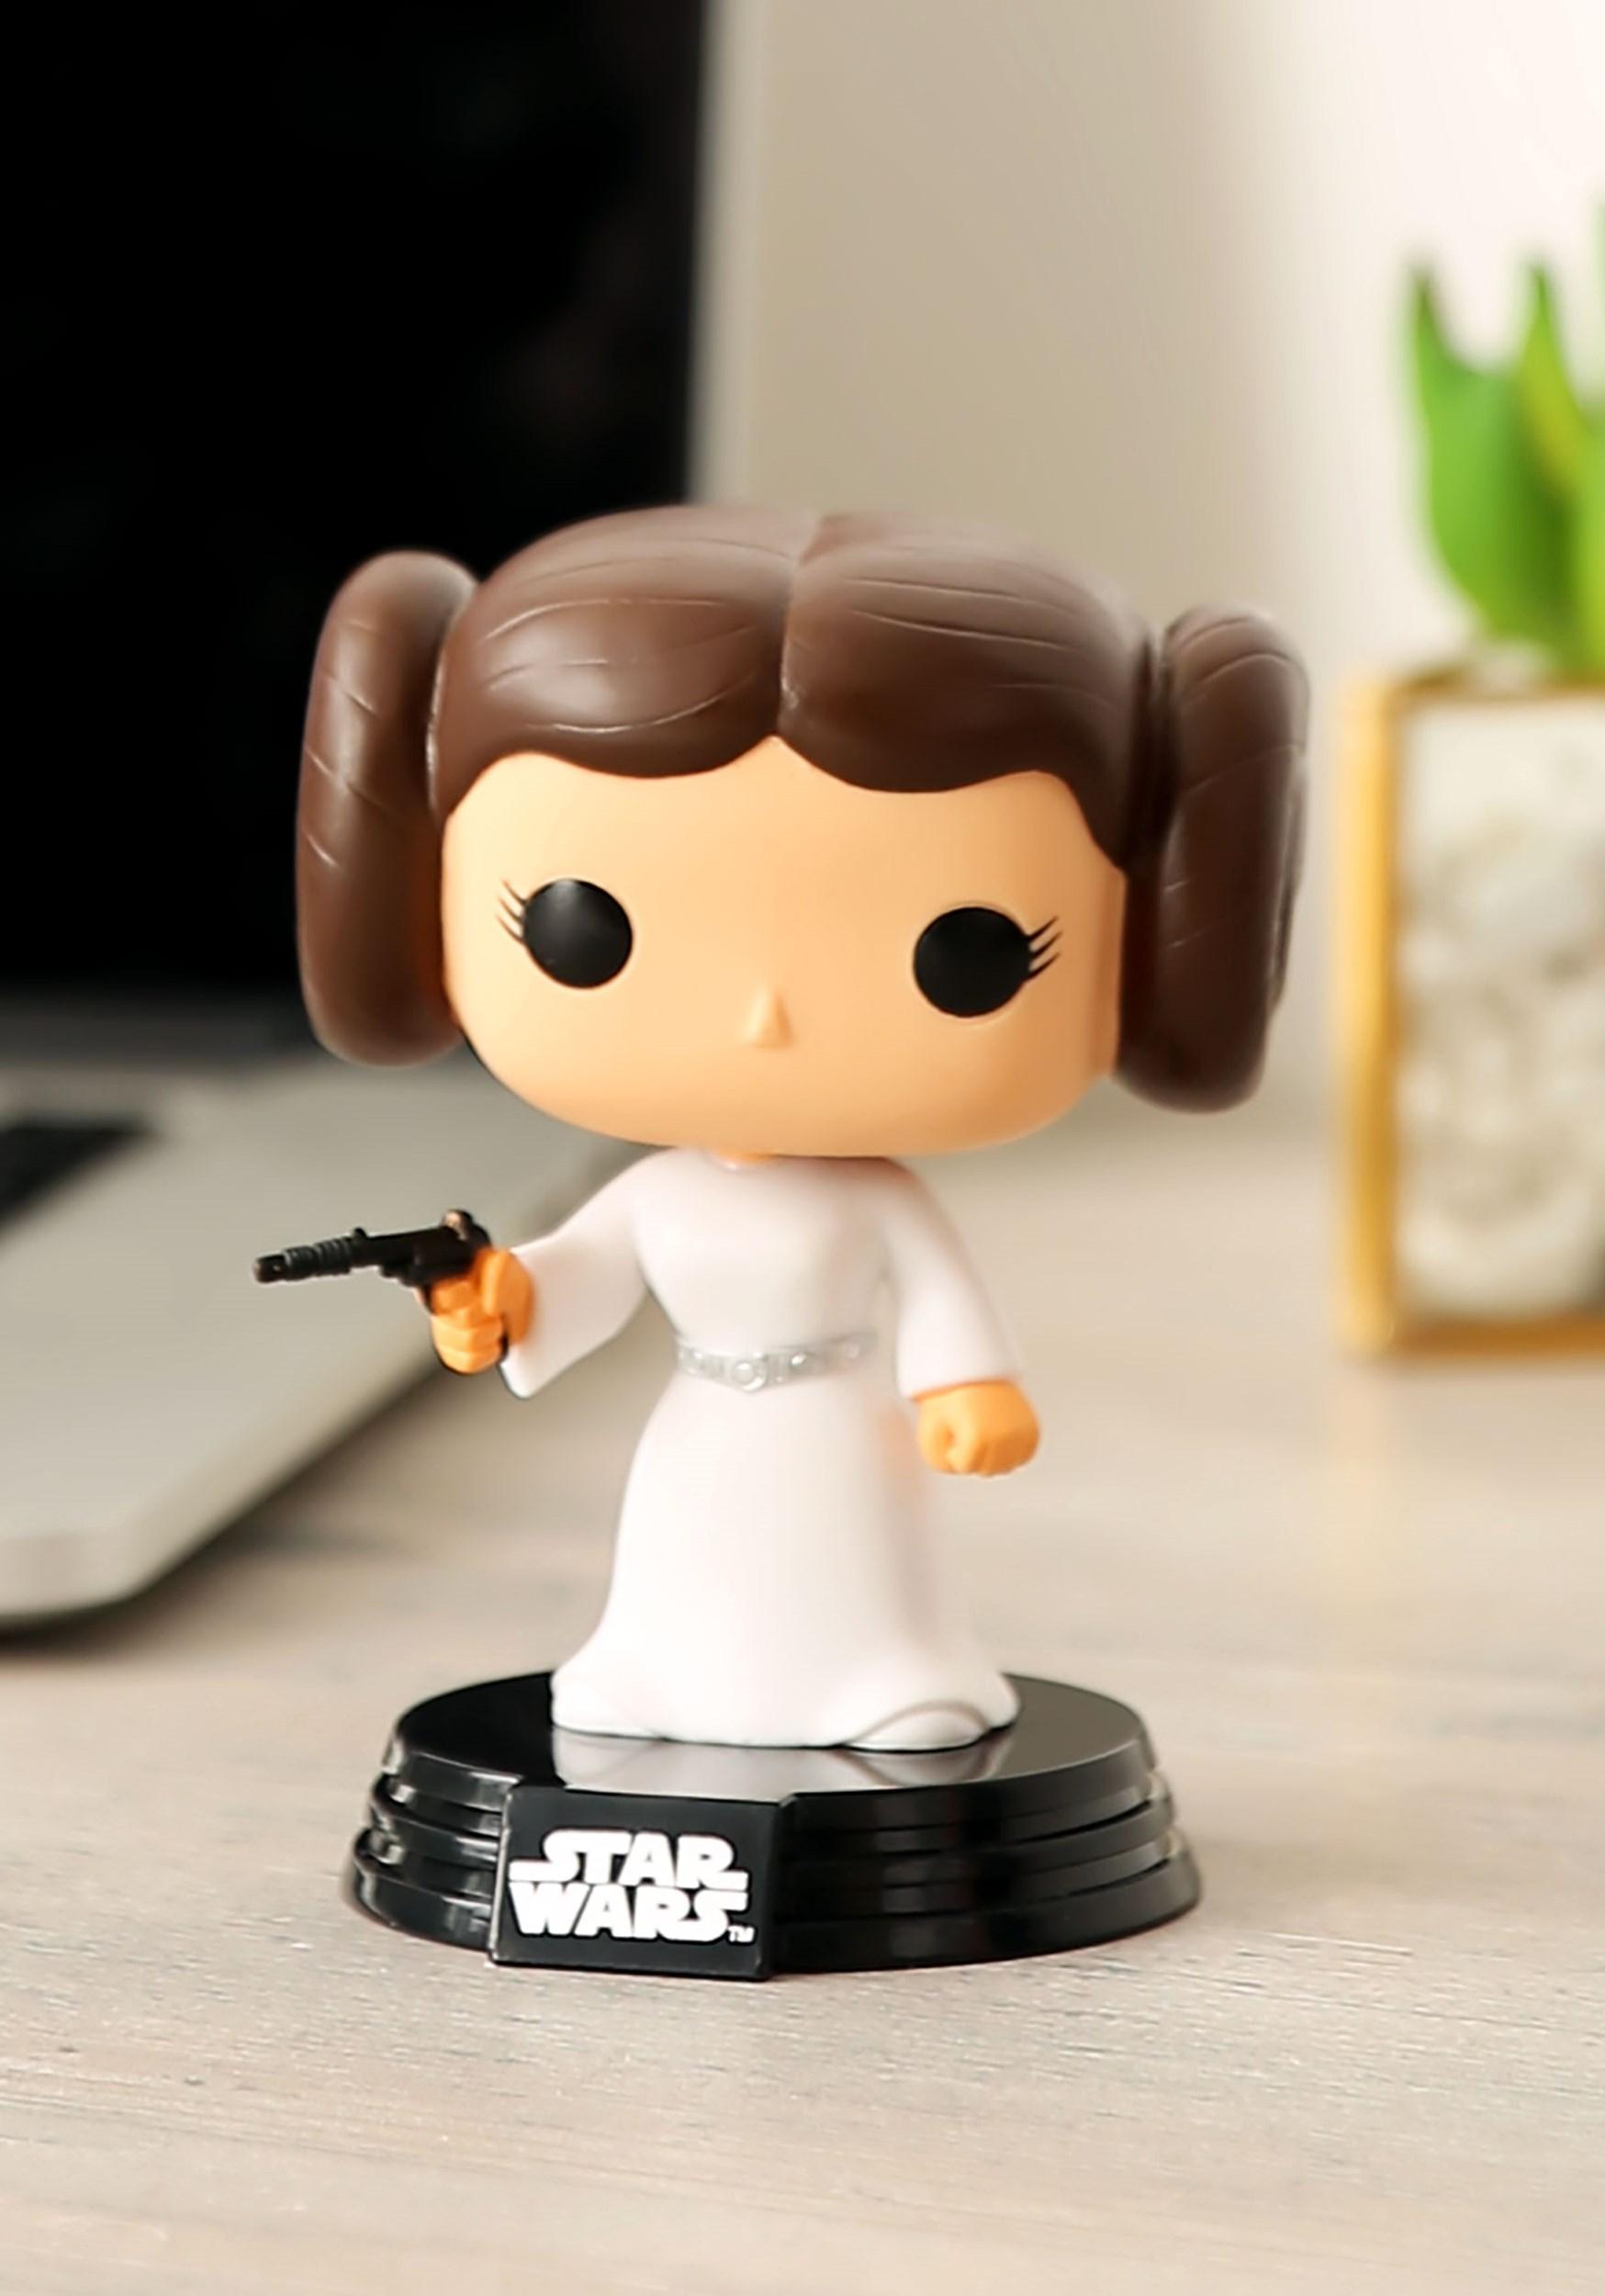 POP Star Wars Princess Leia Bobblehead FN2319